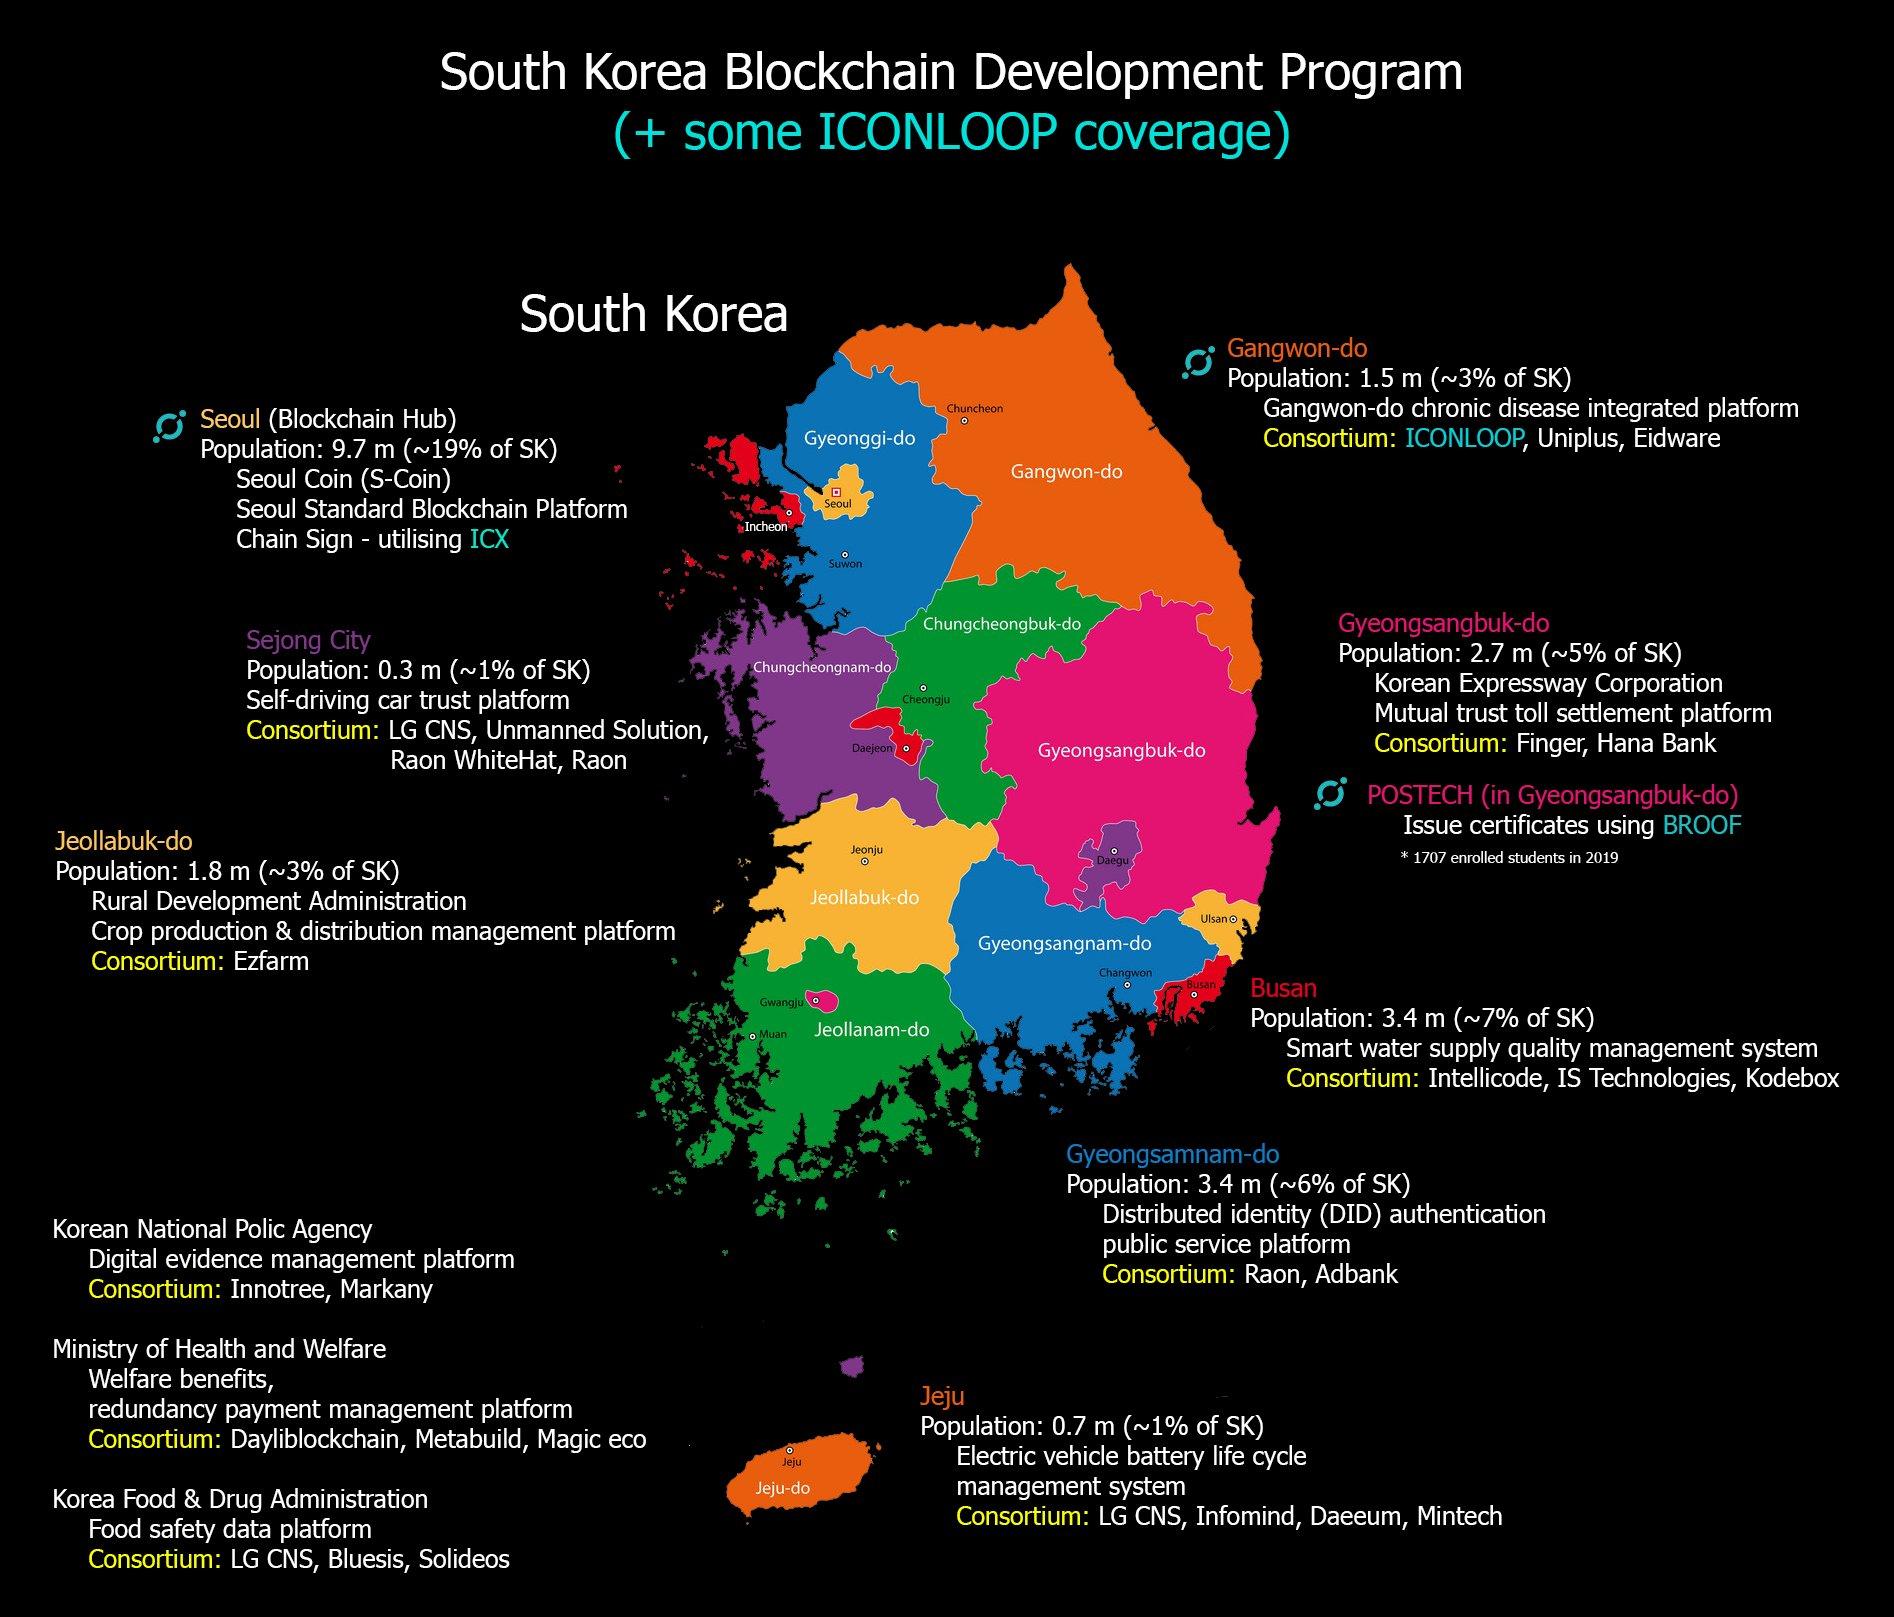 ICONLOOP South Korea Government